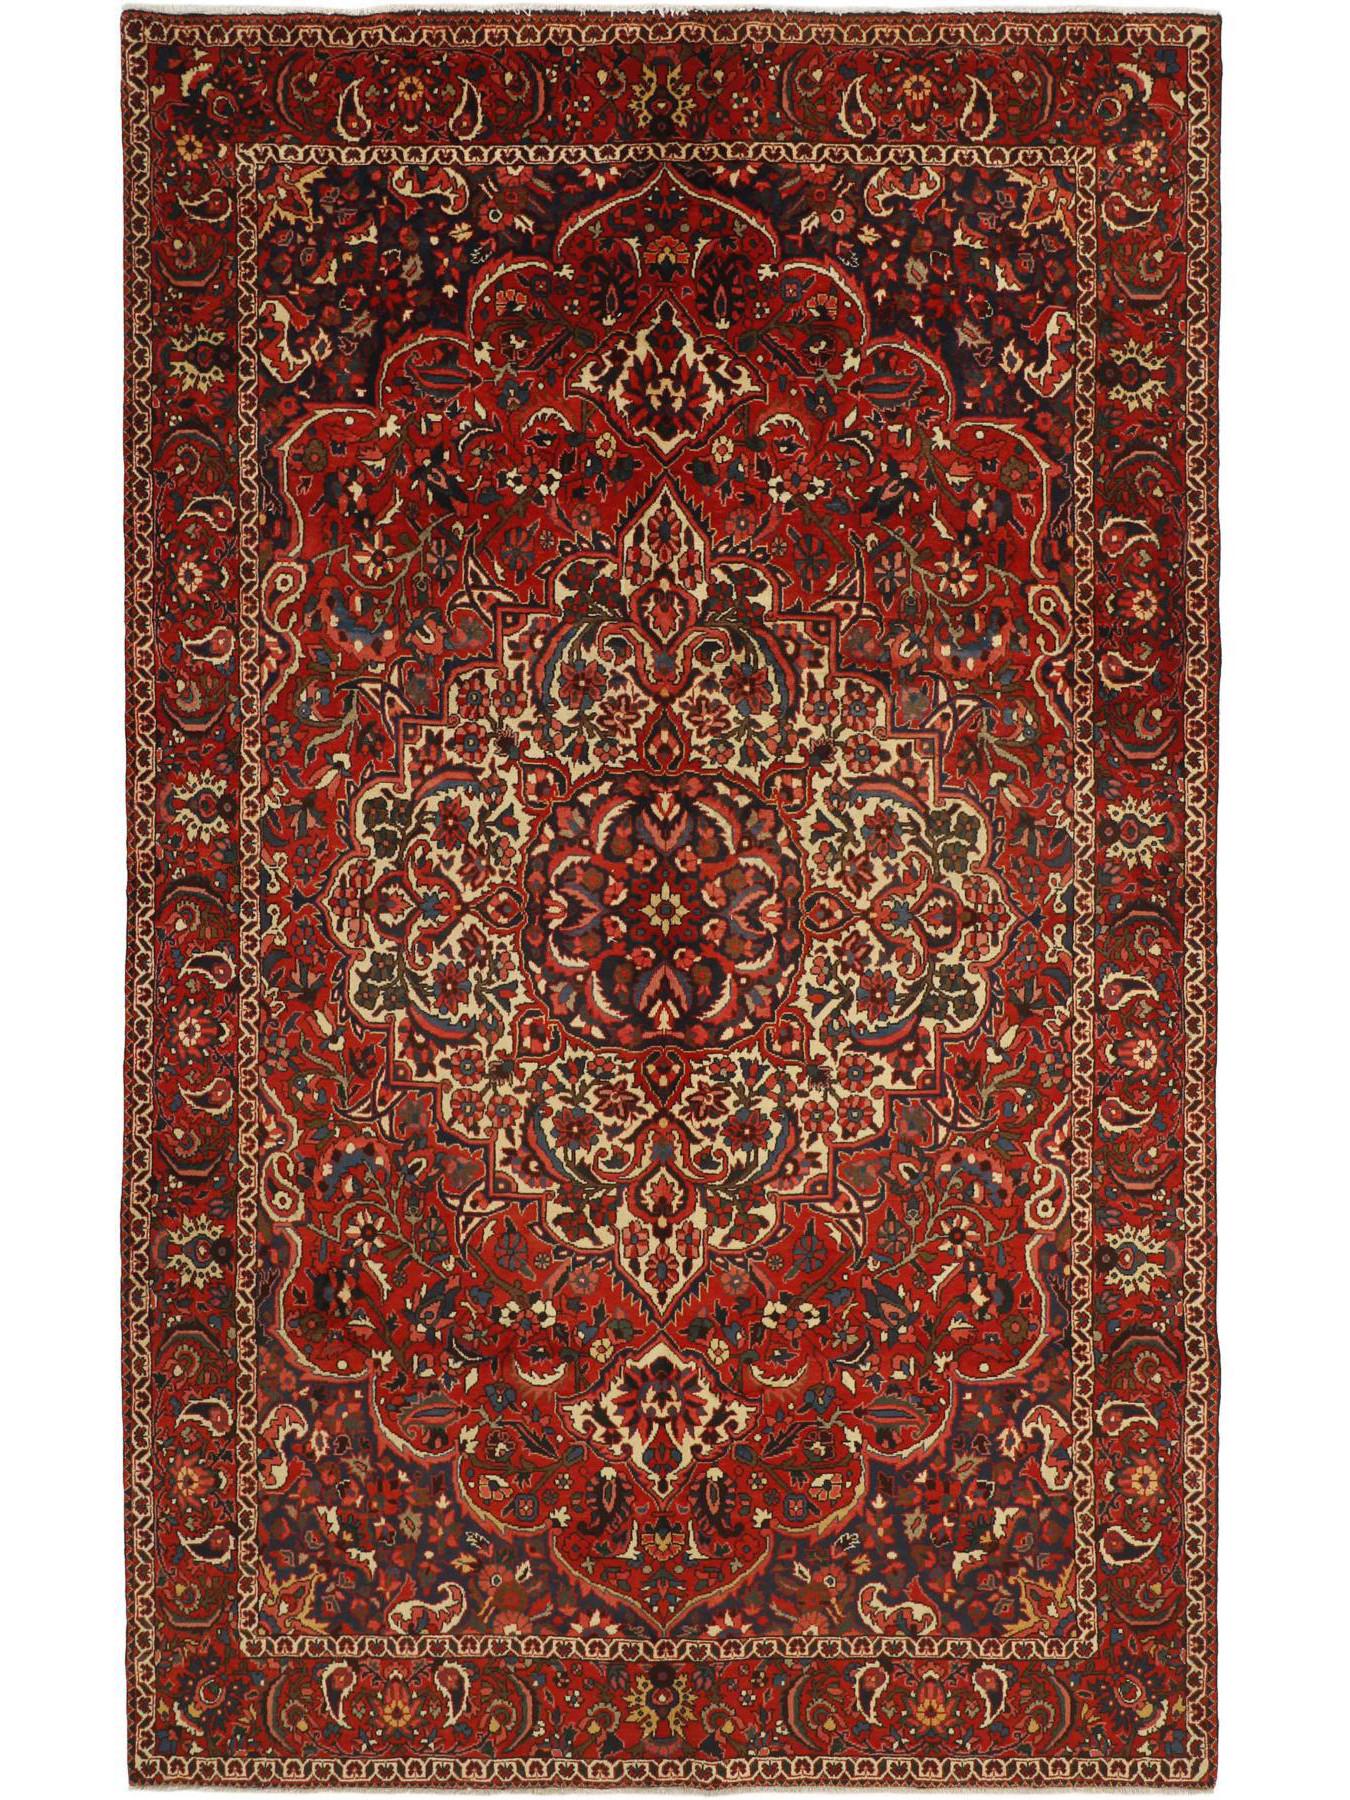 Tapis persans - Bakhtiar